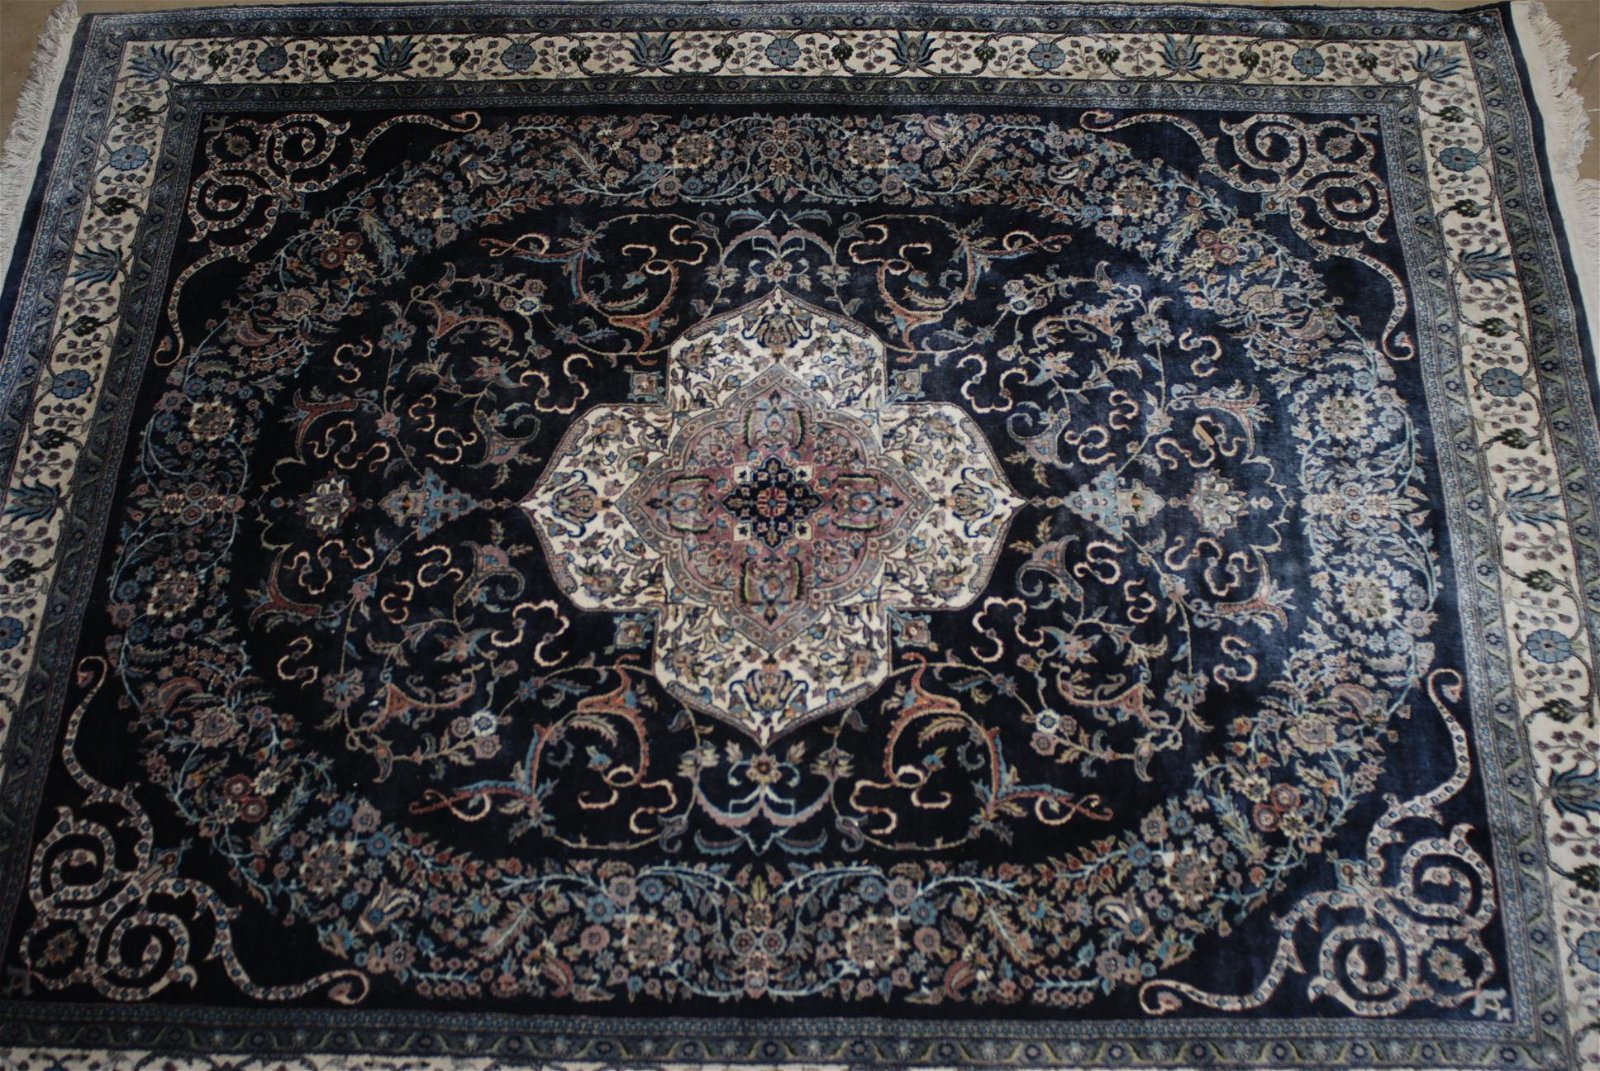 Large Oriental Rug 8 x 10 Feet by Mir in Pakistan